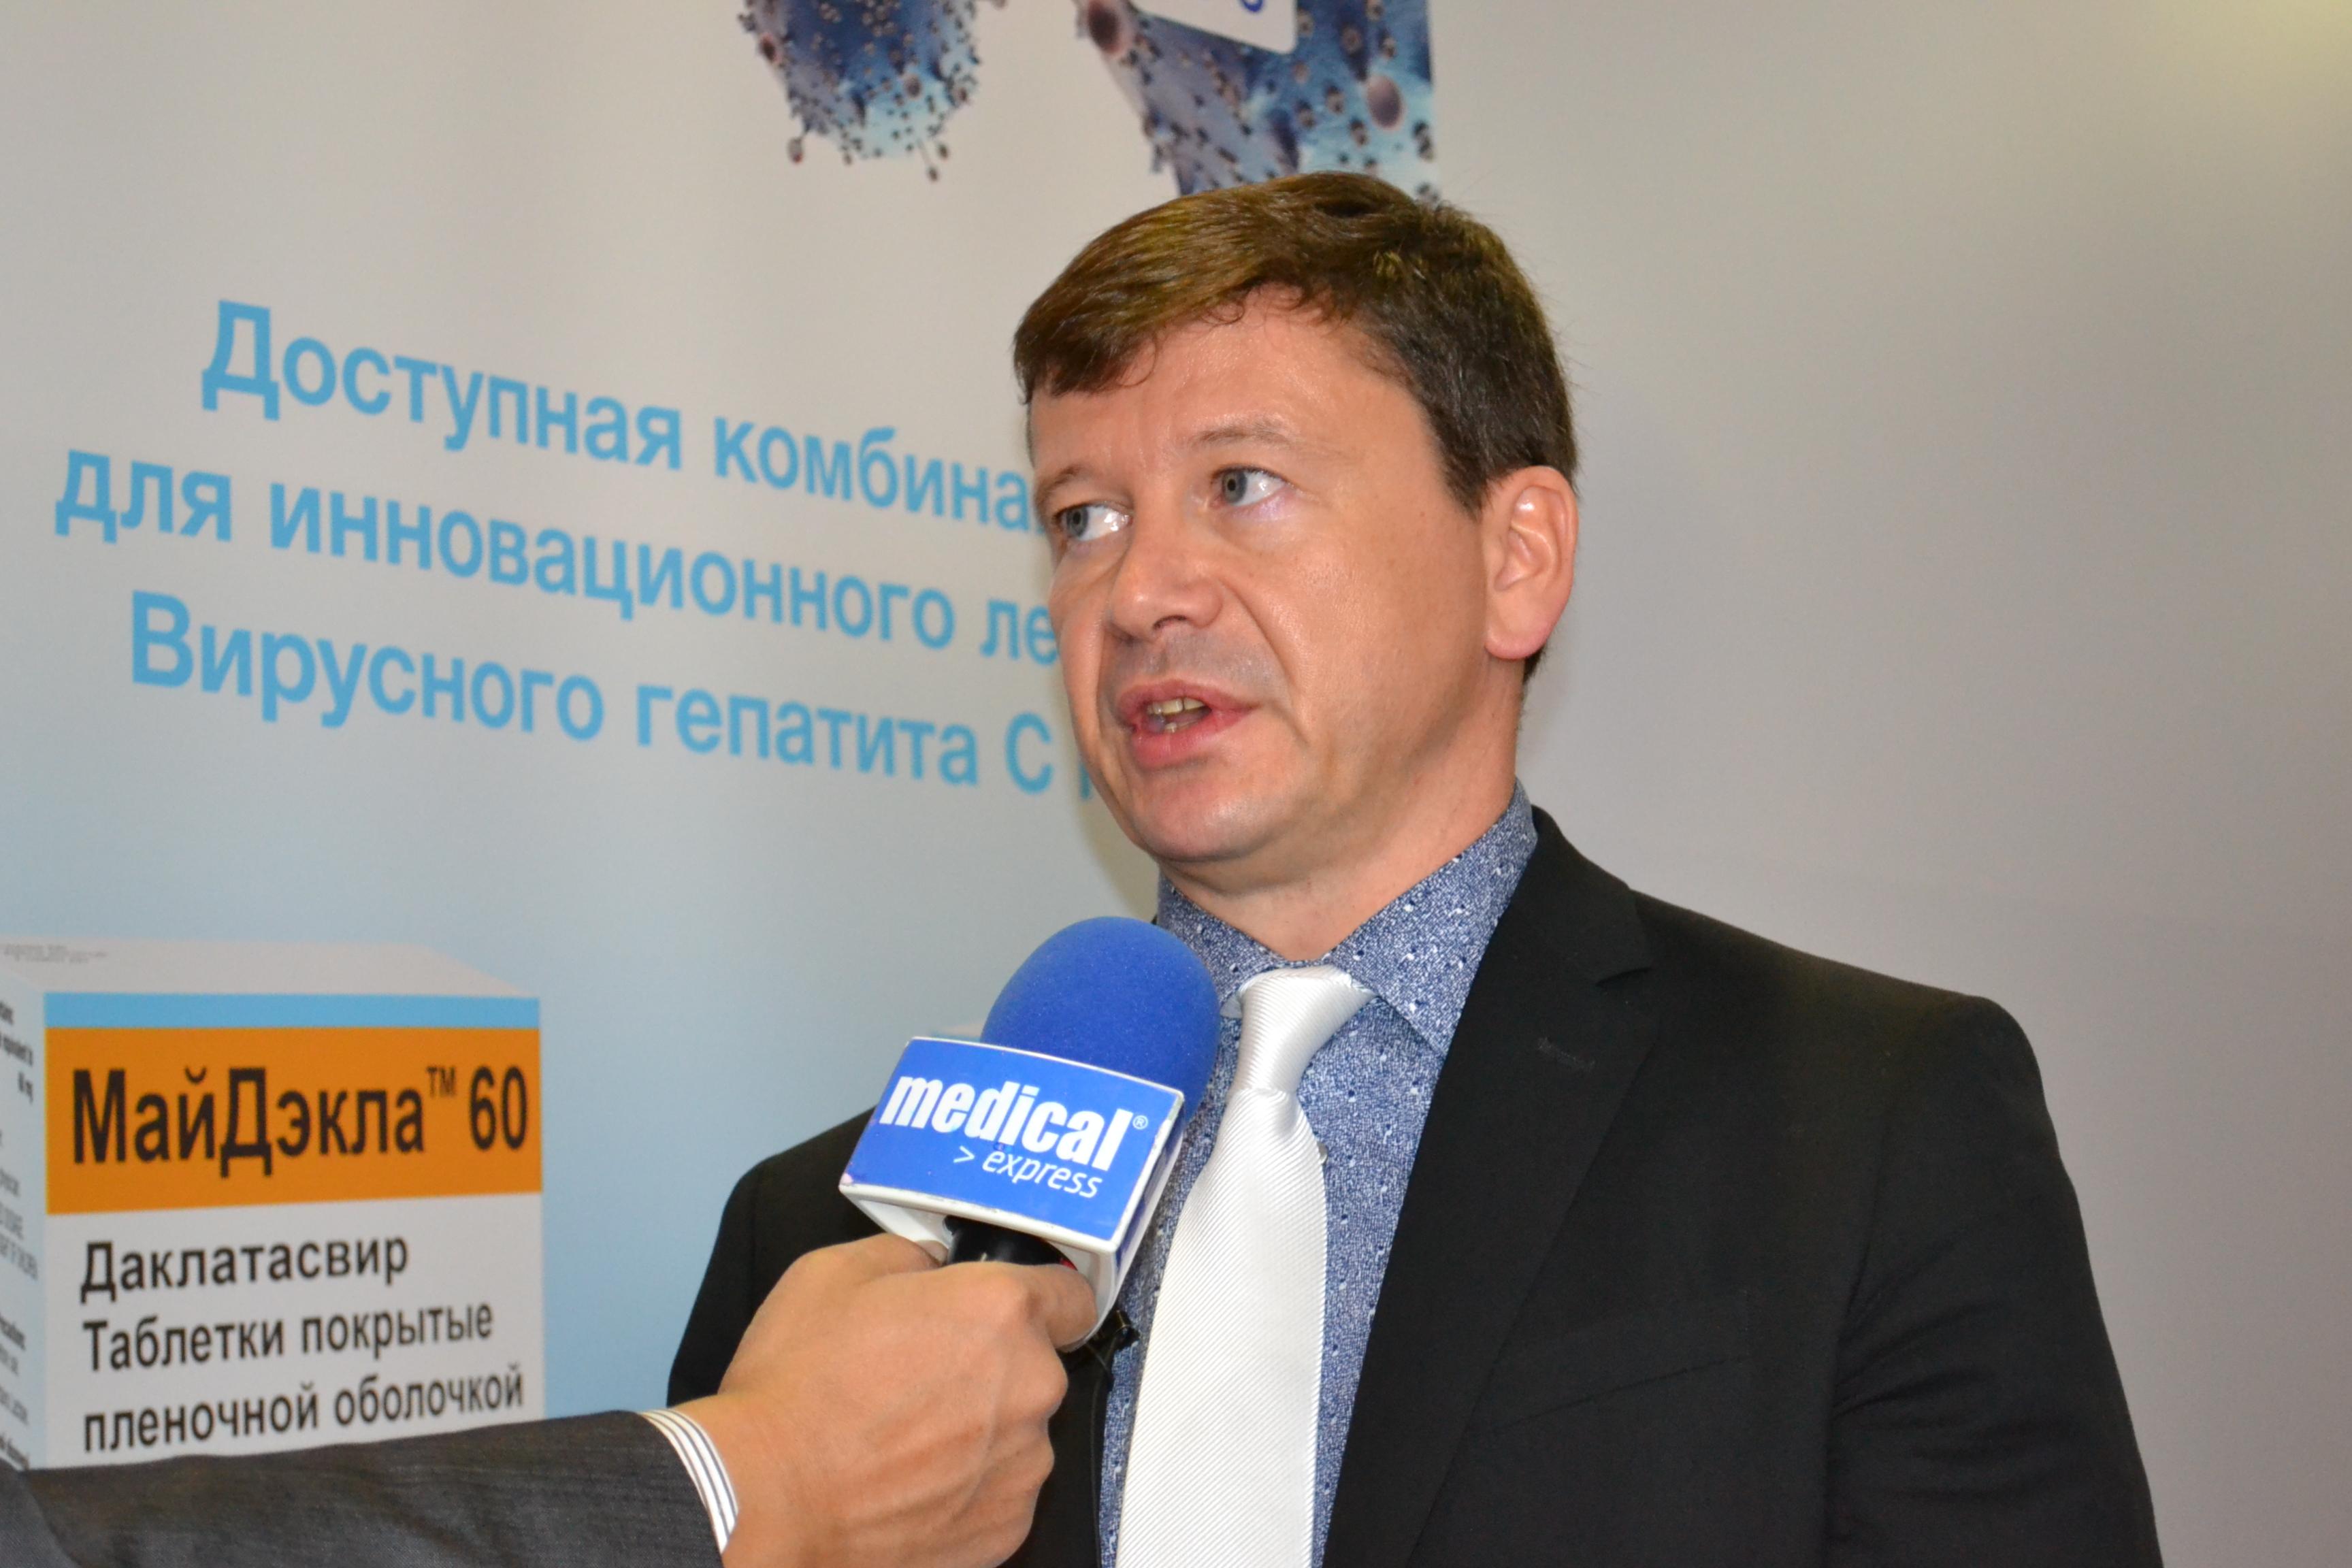 http://medicalexpress.ru/uploads/reportss/mylan/DSC_0031.JPG